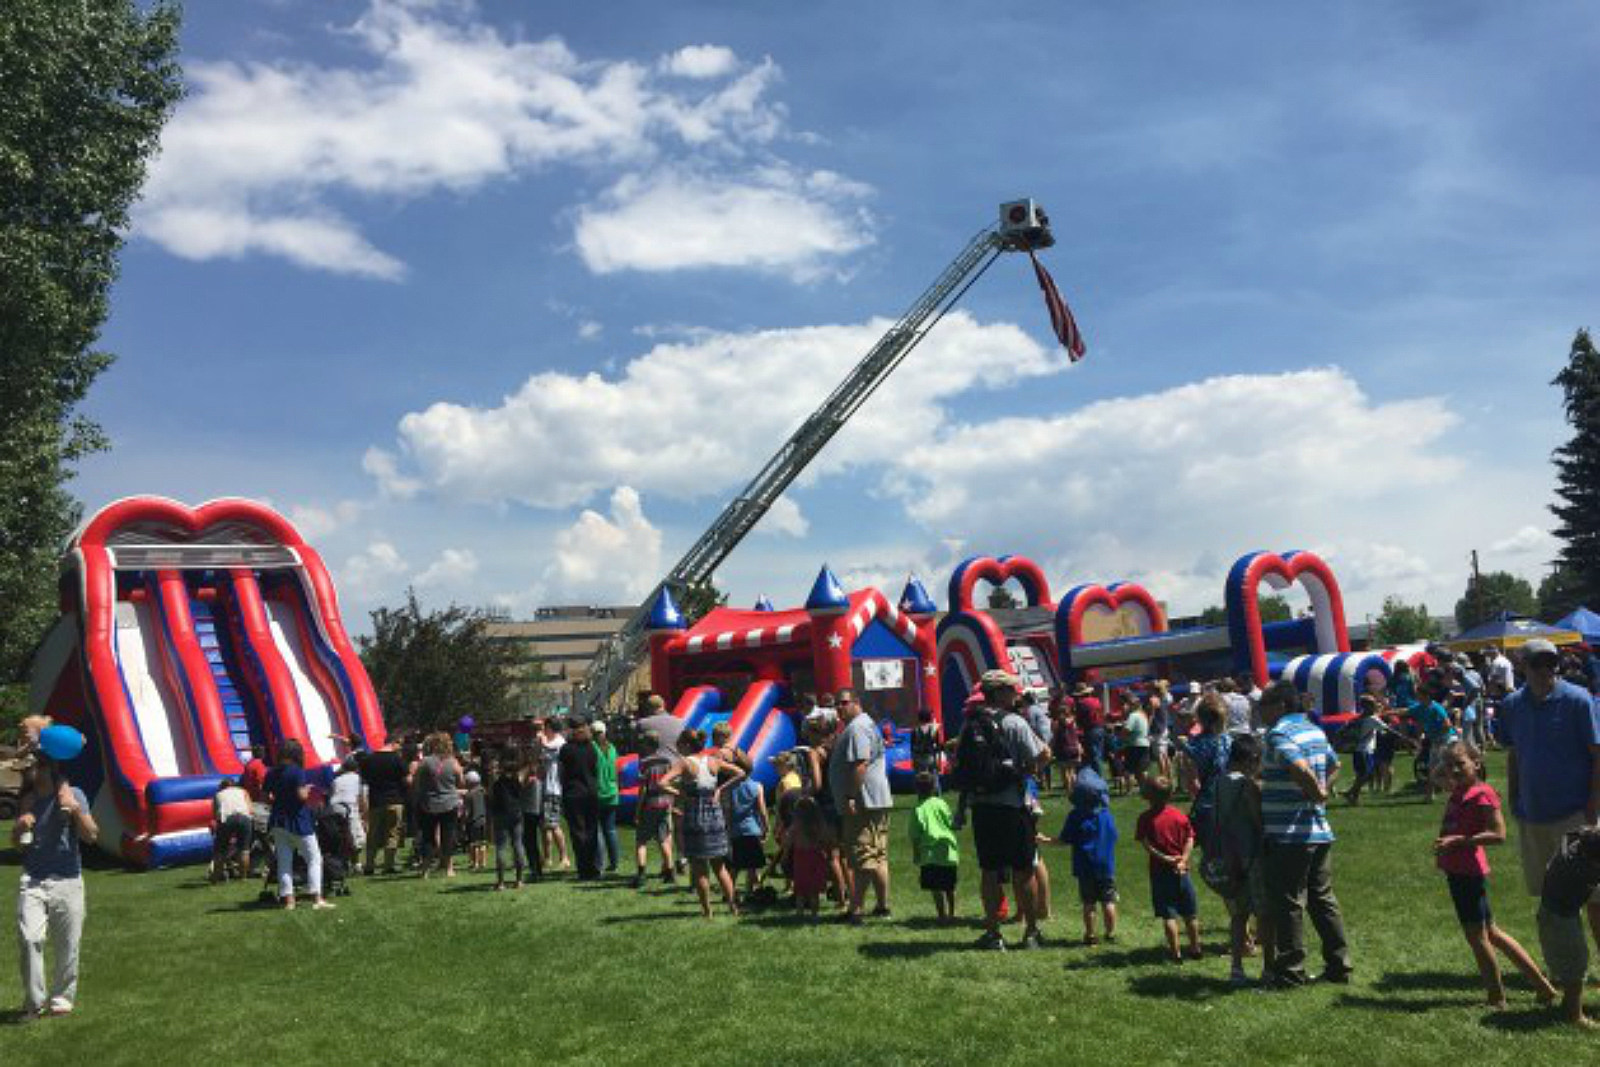 FHB, 4th of July, celebration, Laramie, 2016